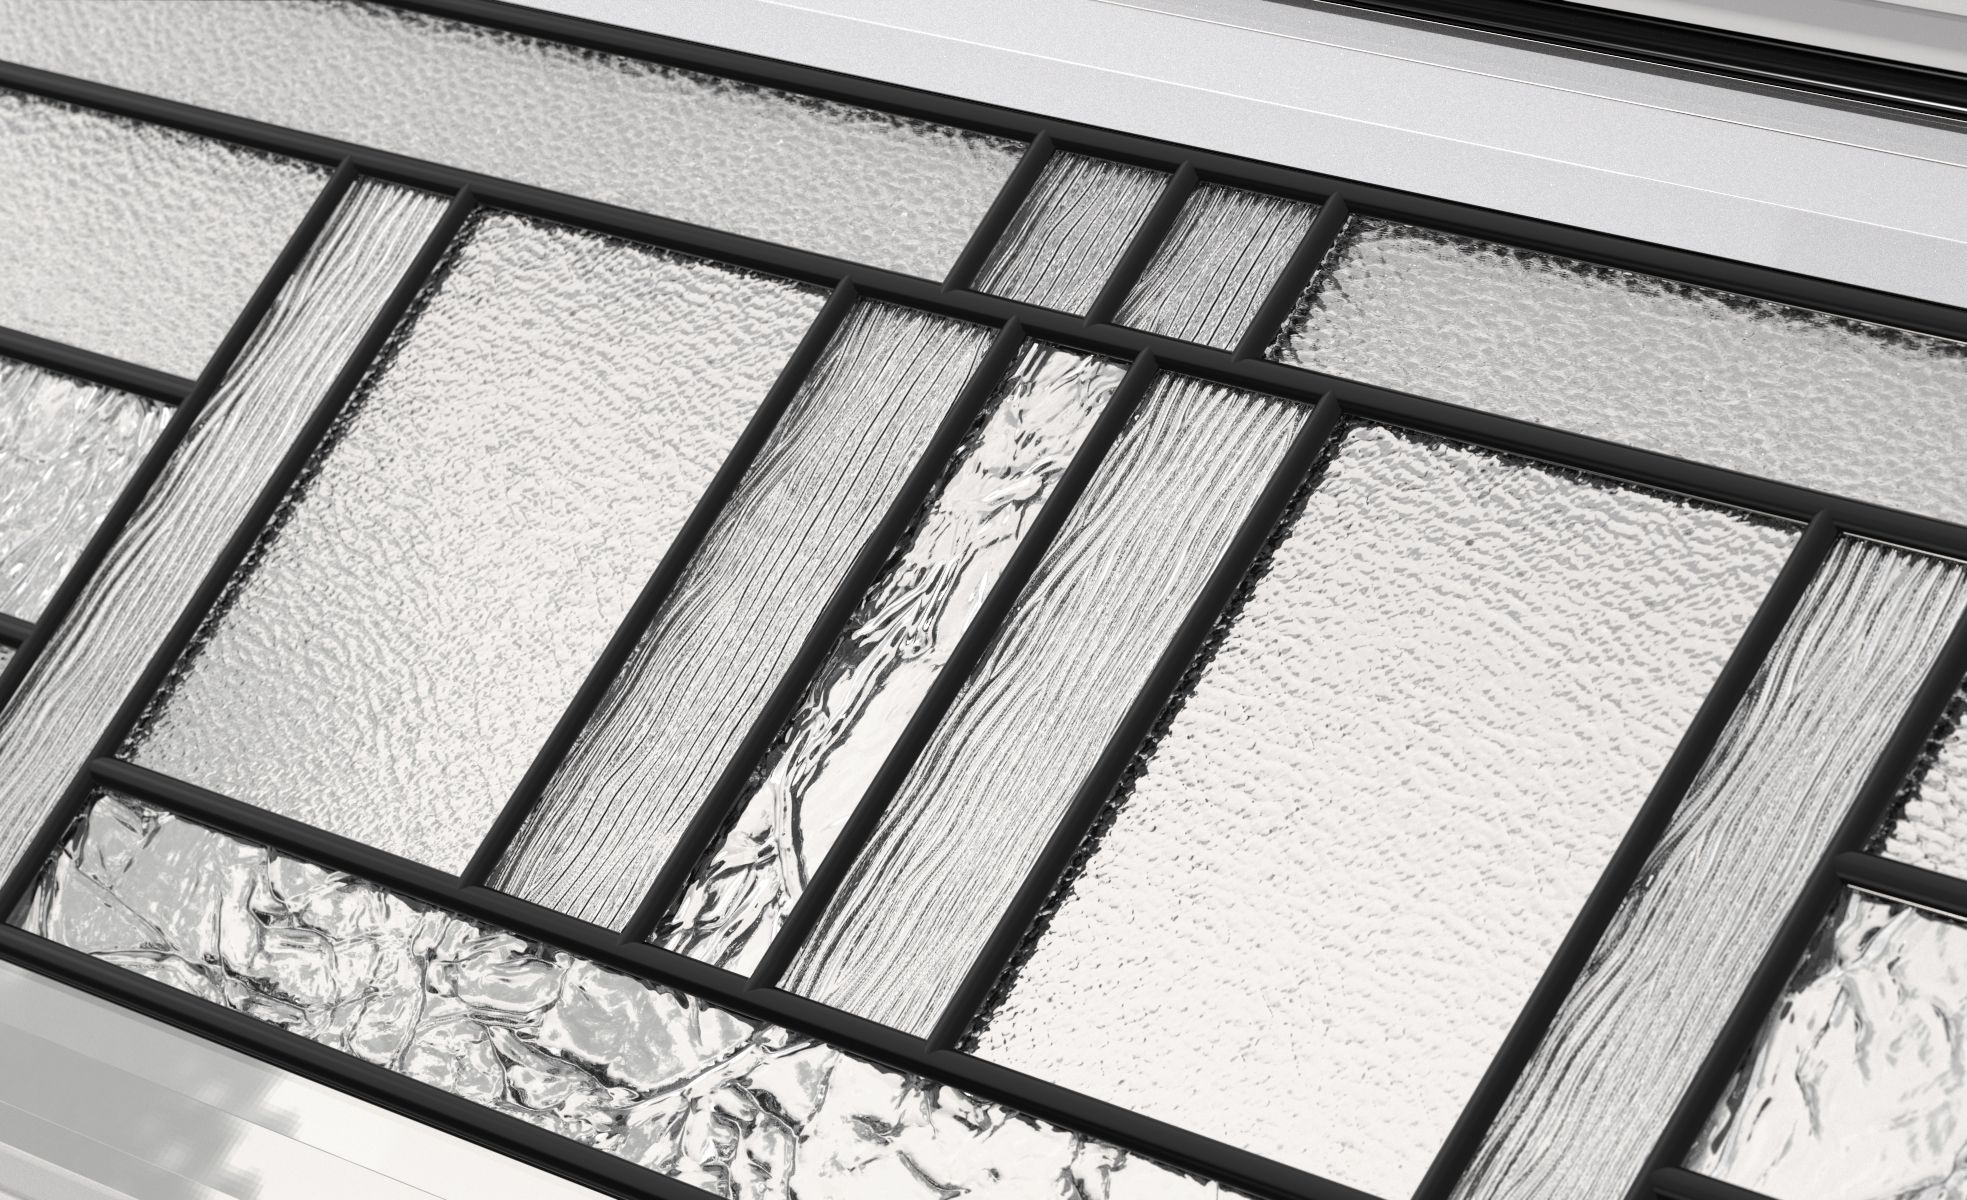 Garage door windows that open  Garage Doors With Stained Glass Windows  voteno